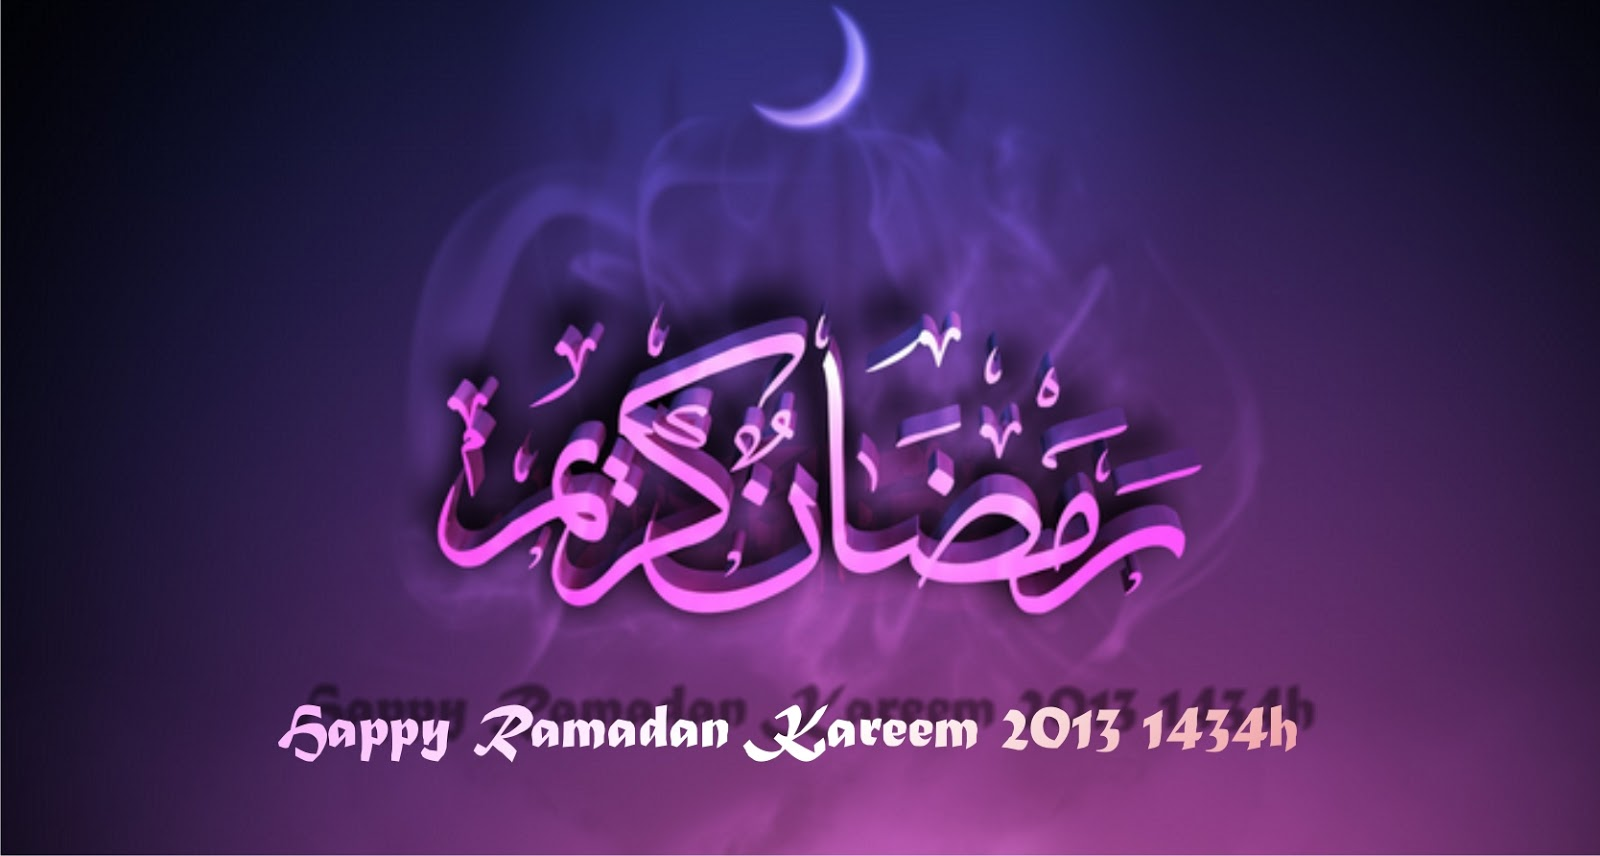 ramadan kareem 2013 1434h greeting cards